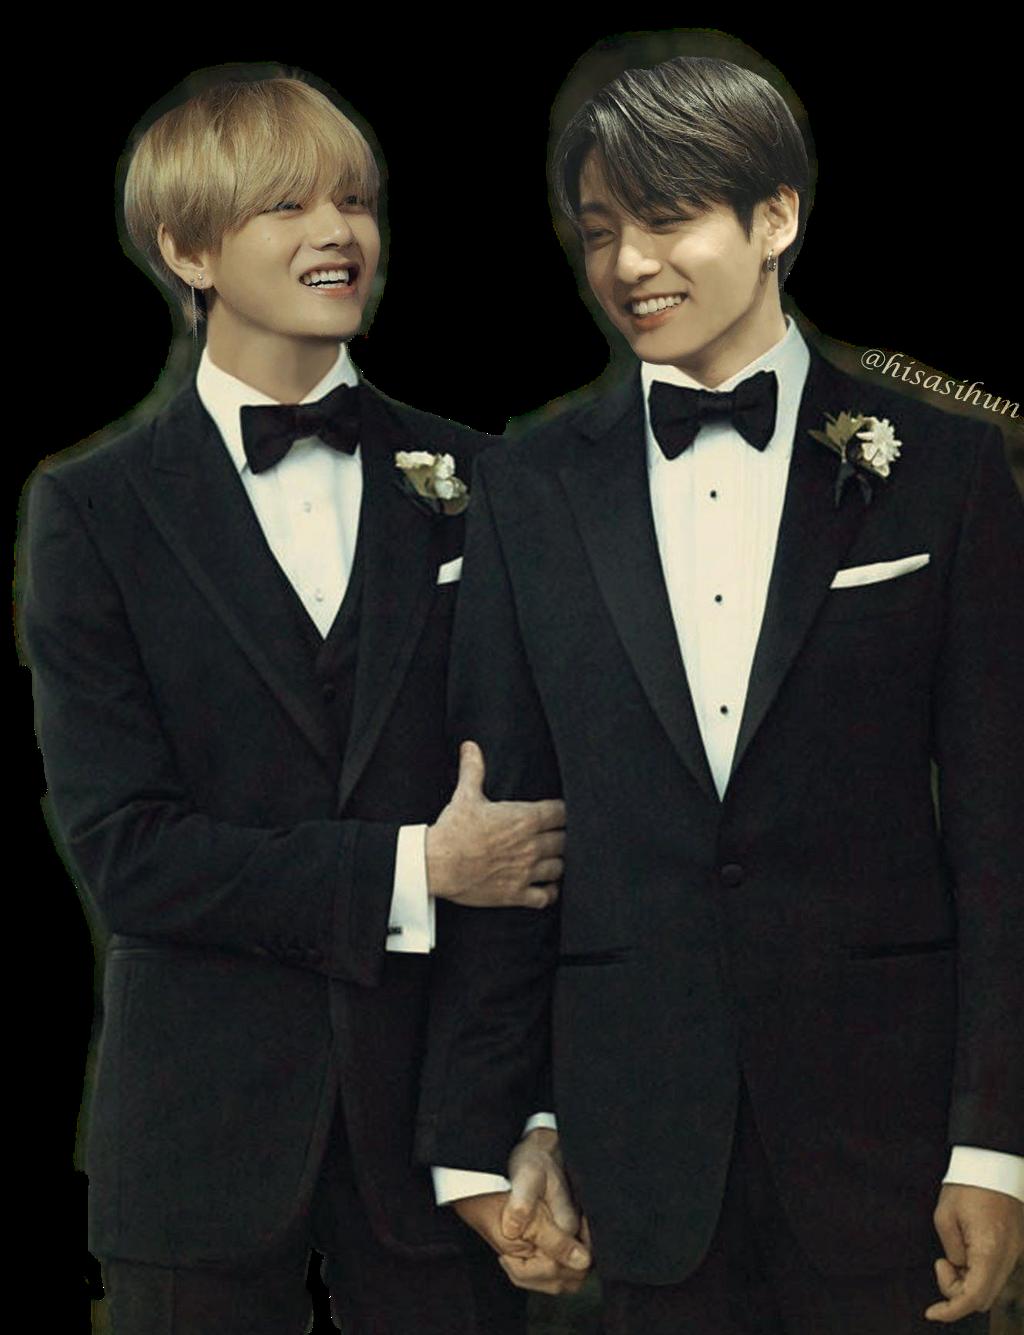 taekook married tuxedo suit wedding taehyung jungkook